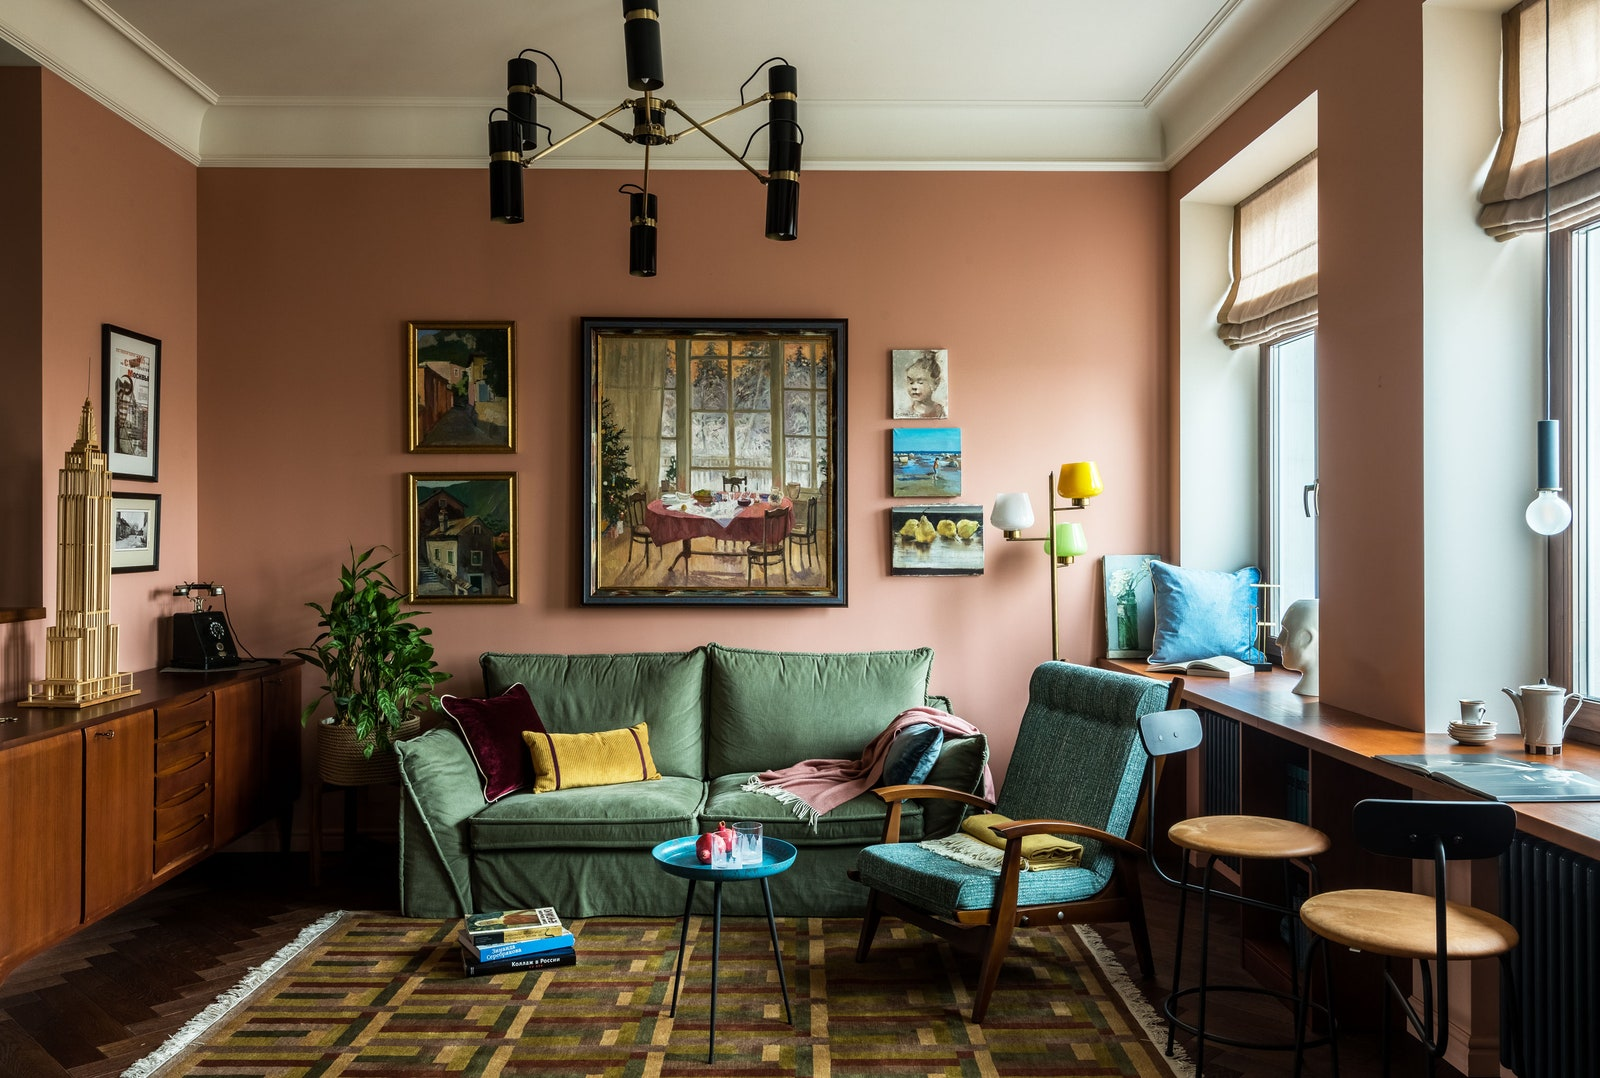 .  Alberta  ENERE.it  Villa Lumi   Repeat Story  MarkPatlisStudio   Lamps of 506070s   Barcelona Design            ...